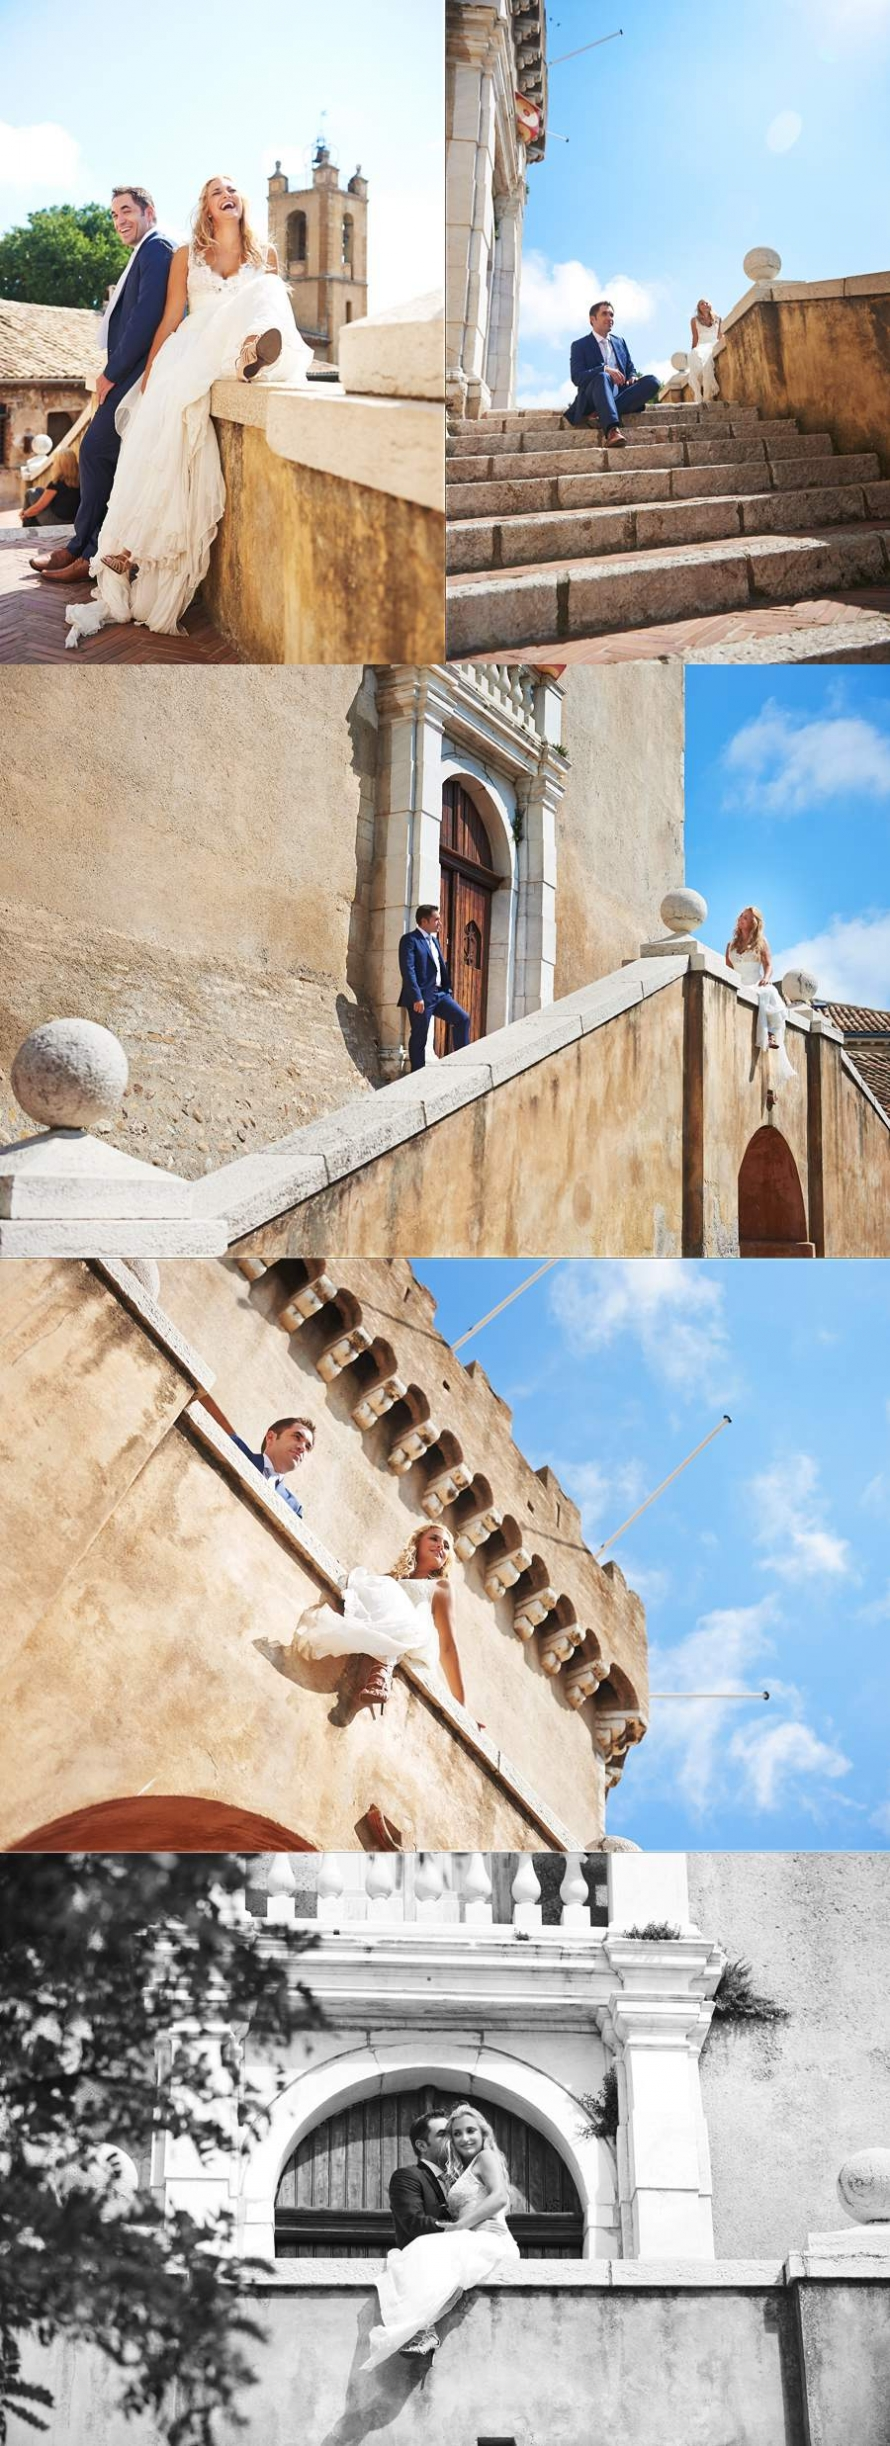 Stavros Efi wedding photos02